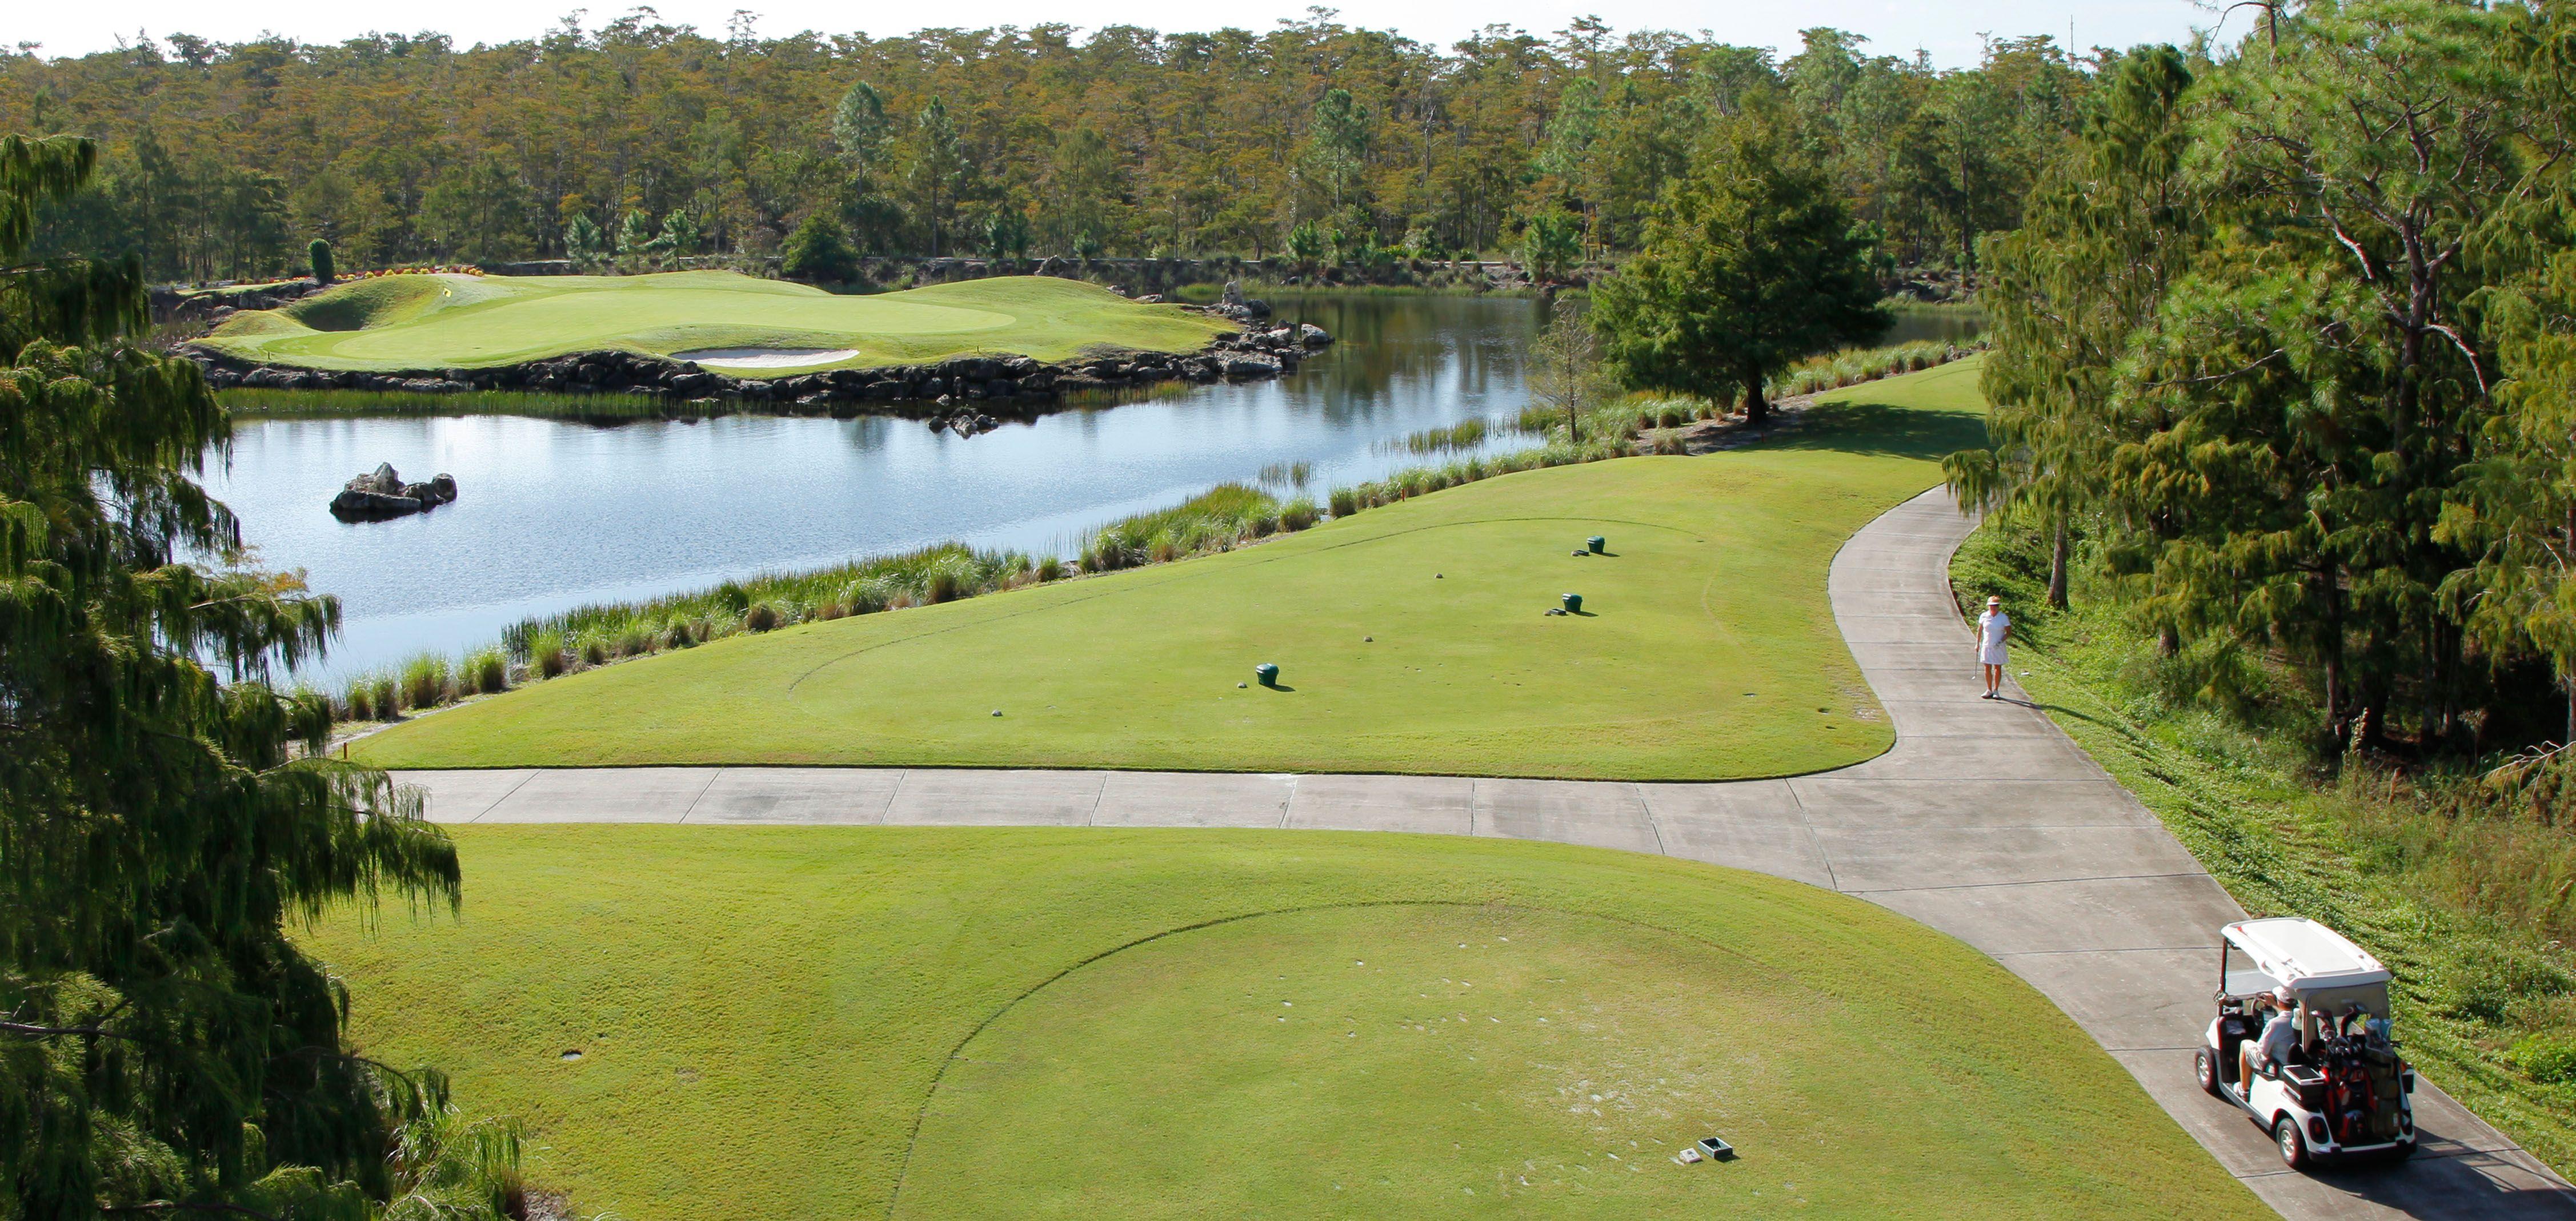 Par 72 Golf Course Designed By P B Dye In Naples Florida Golf Courses Gulf Coast Beaches Cypress